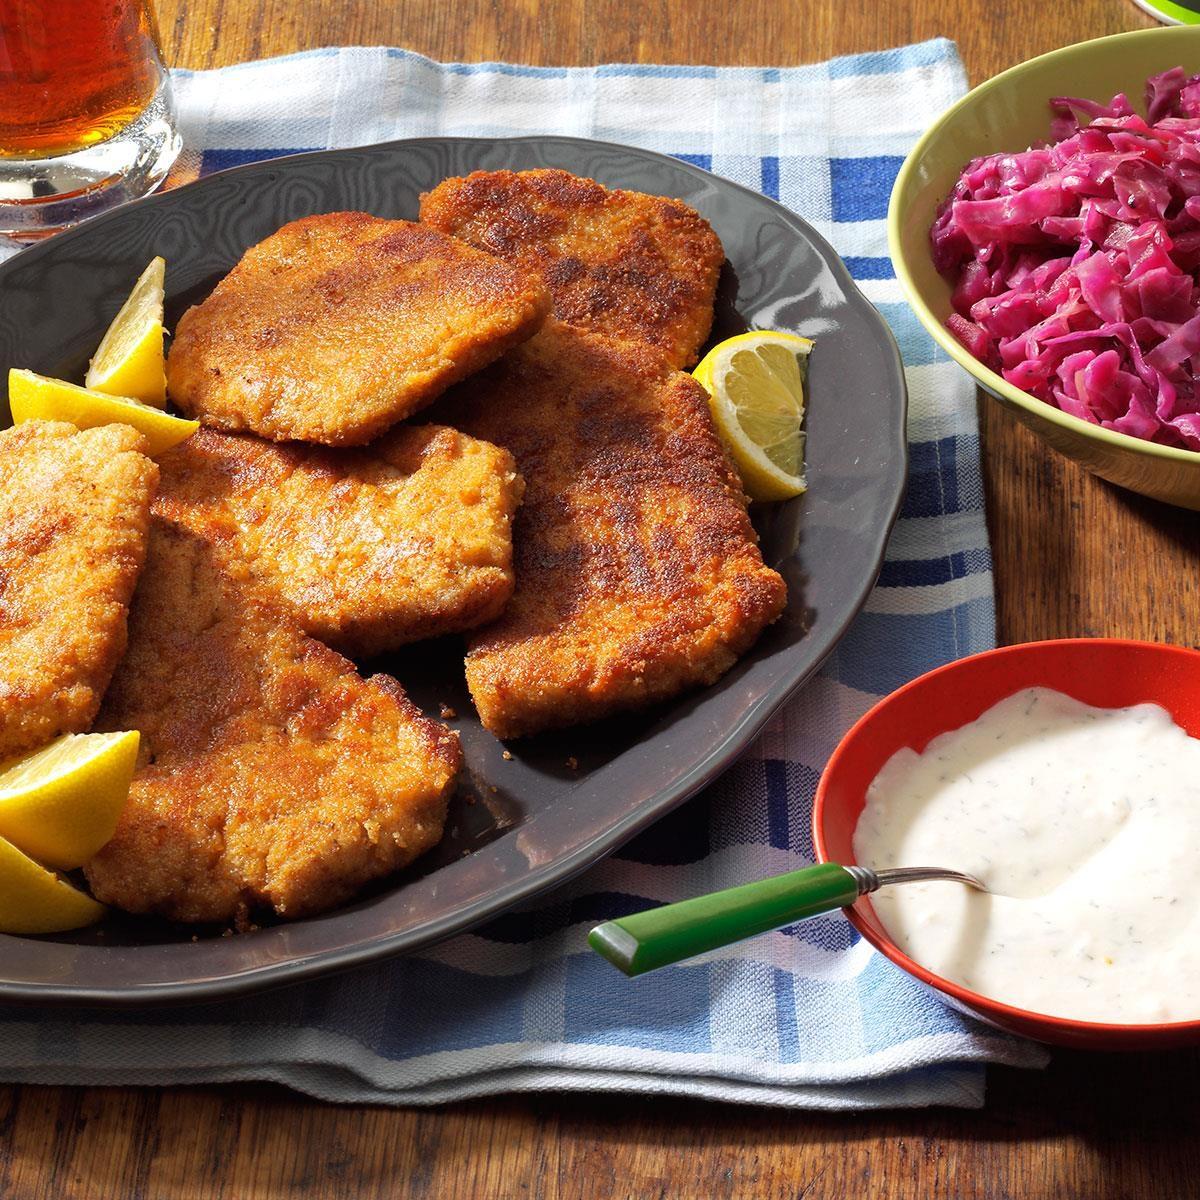 Friday: Pork Schnitzel with Dill Sauce